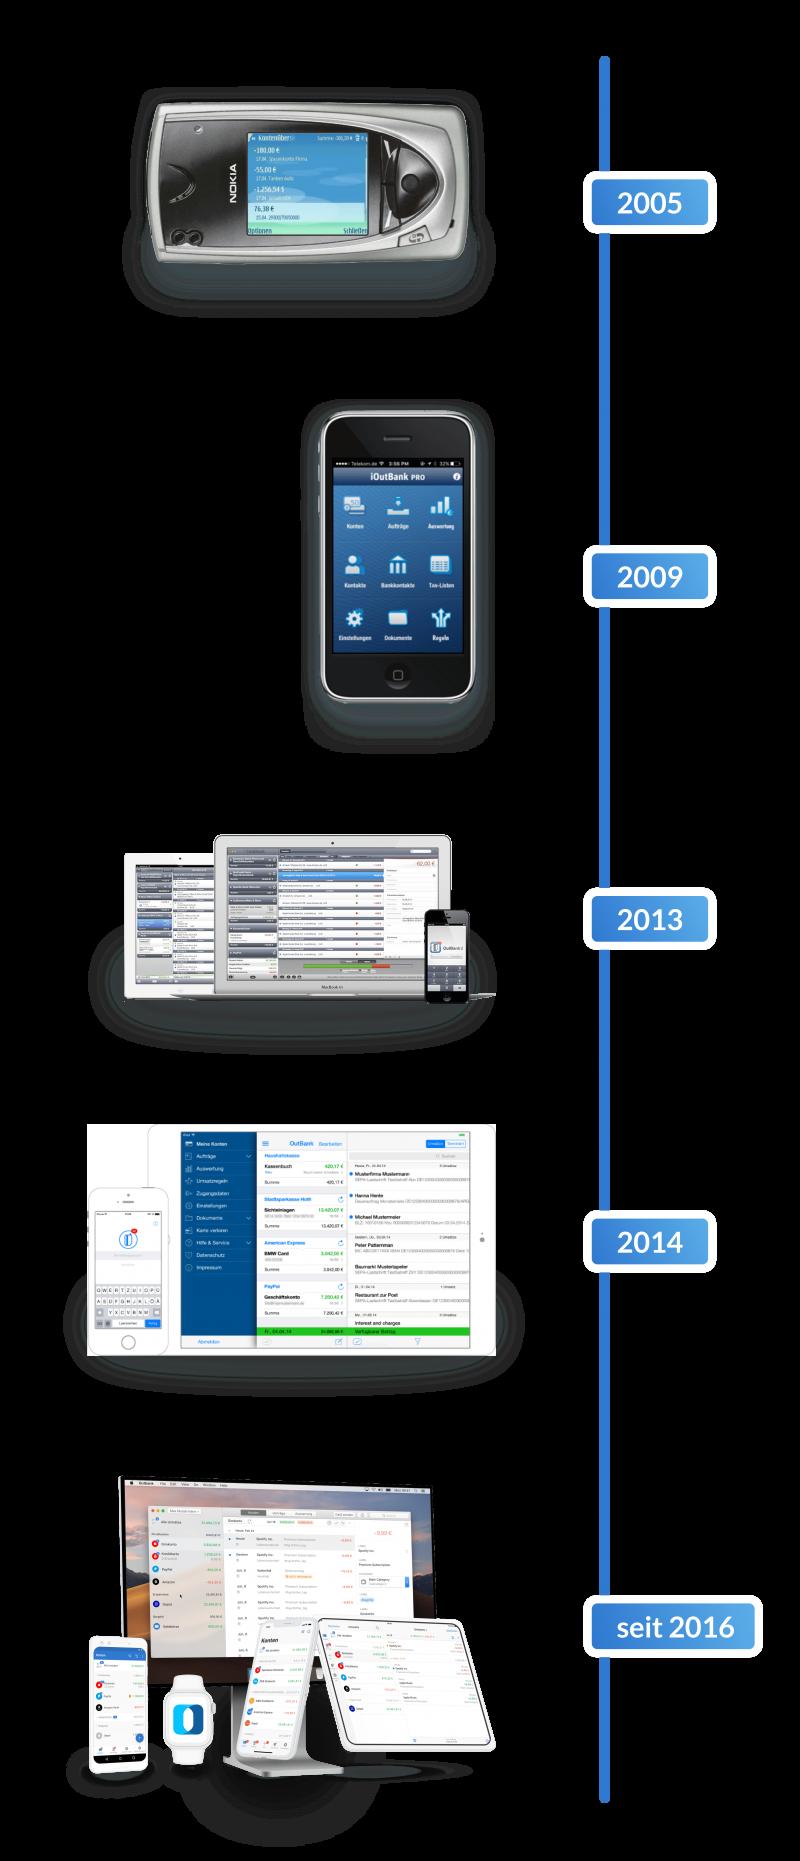 Outbank-Ueber-Outbank-Historie-App-Versionen-Timeline-2